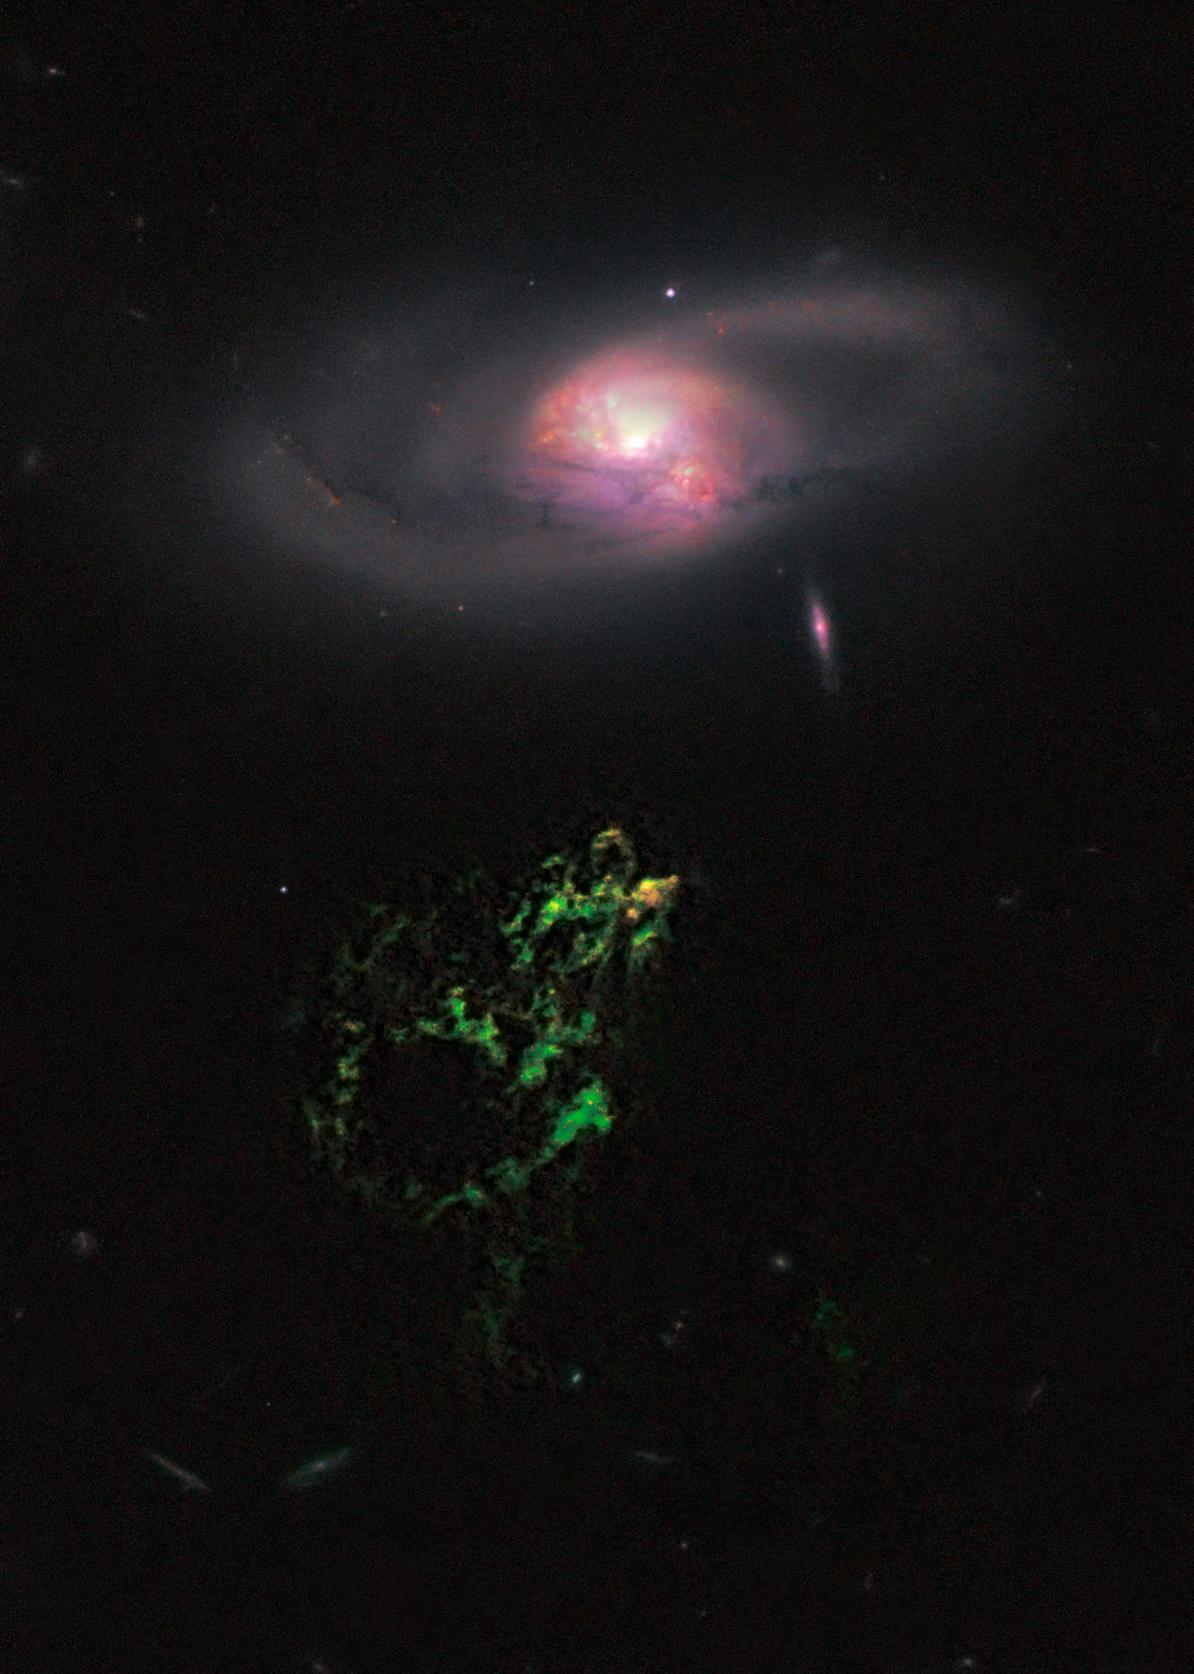 HUBBLE'S TOP 100 • #94 • Credit: NASA, ESA, William Keel (University of Alabama, Tuscaloosa), and the Galaxy Zoo team